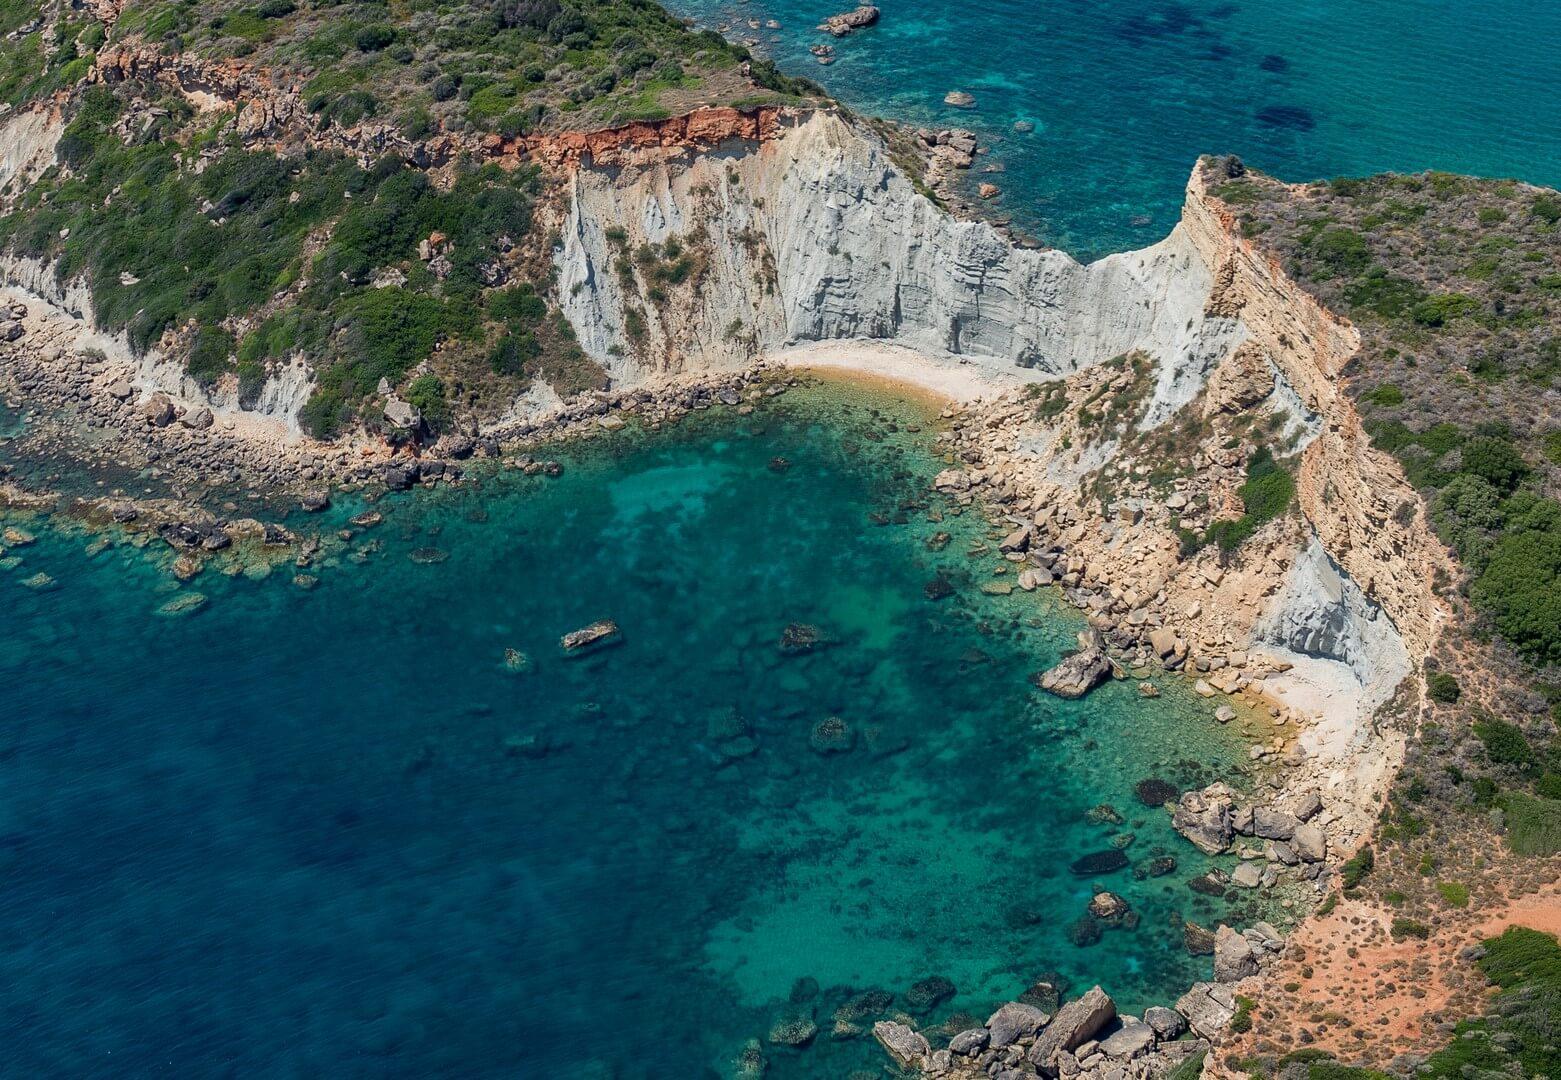 Gerakas beach, caretta caretta turtle beach